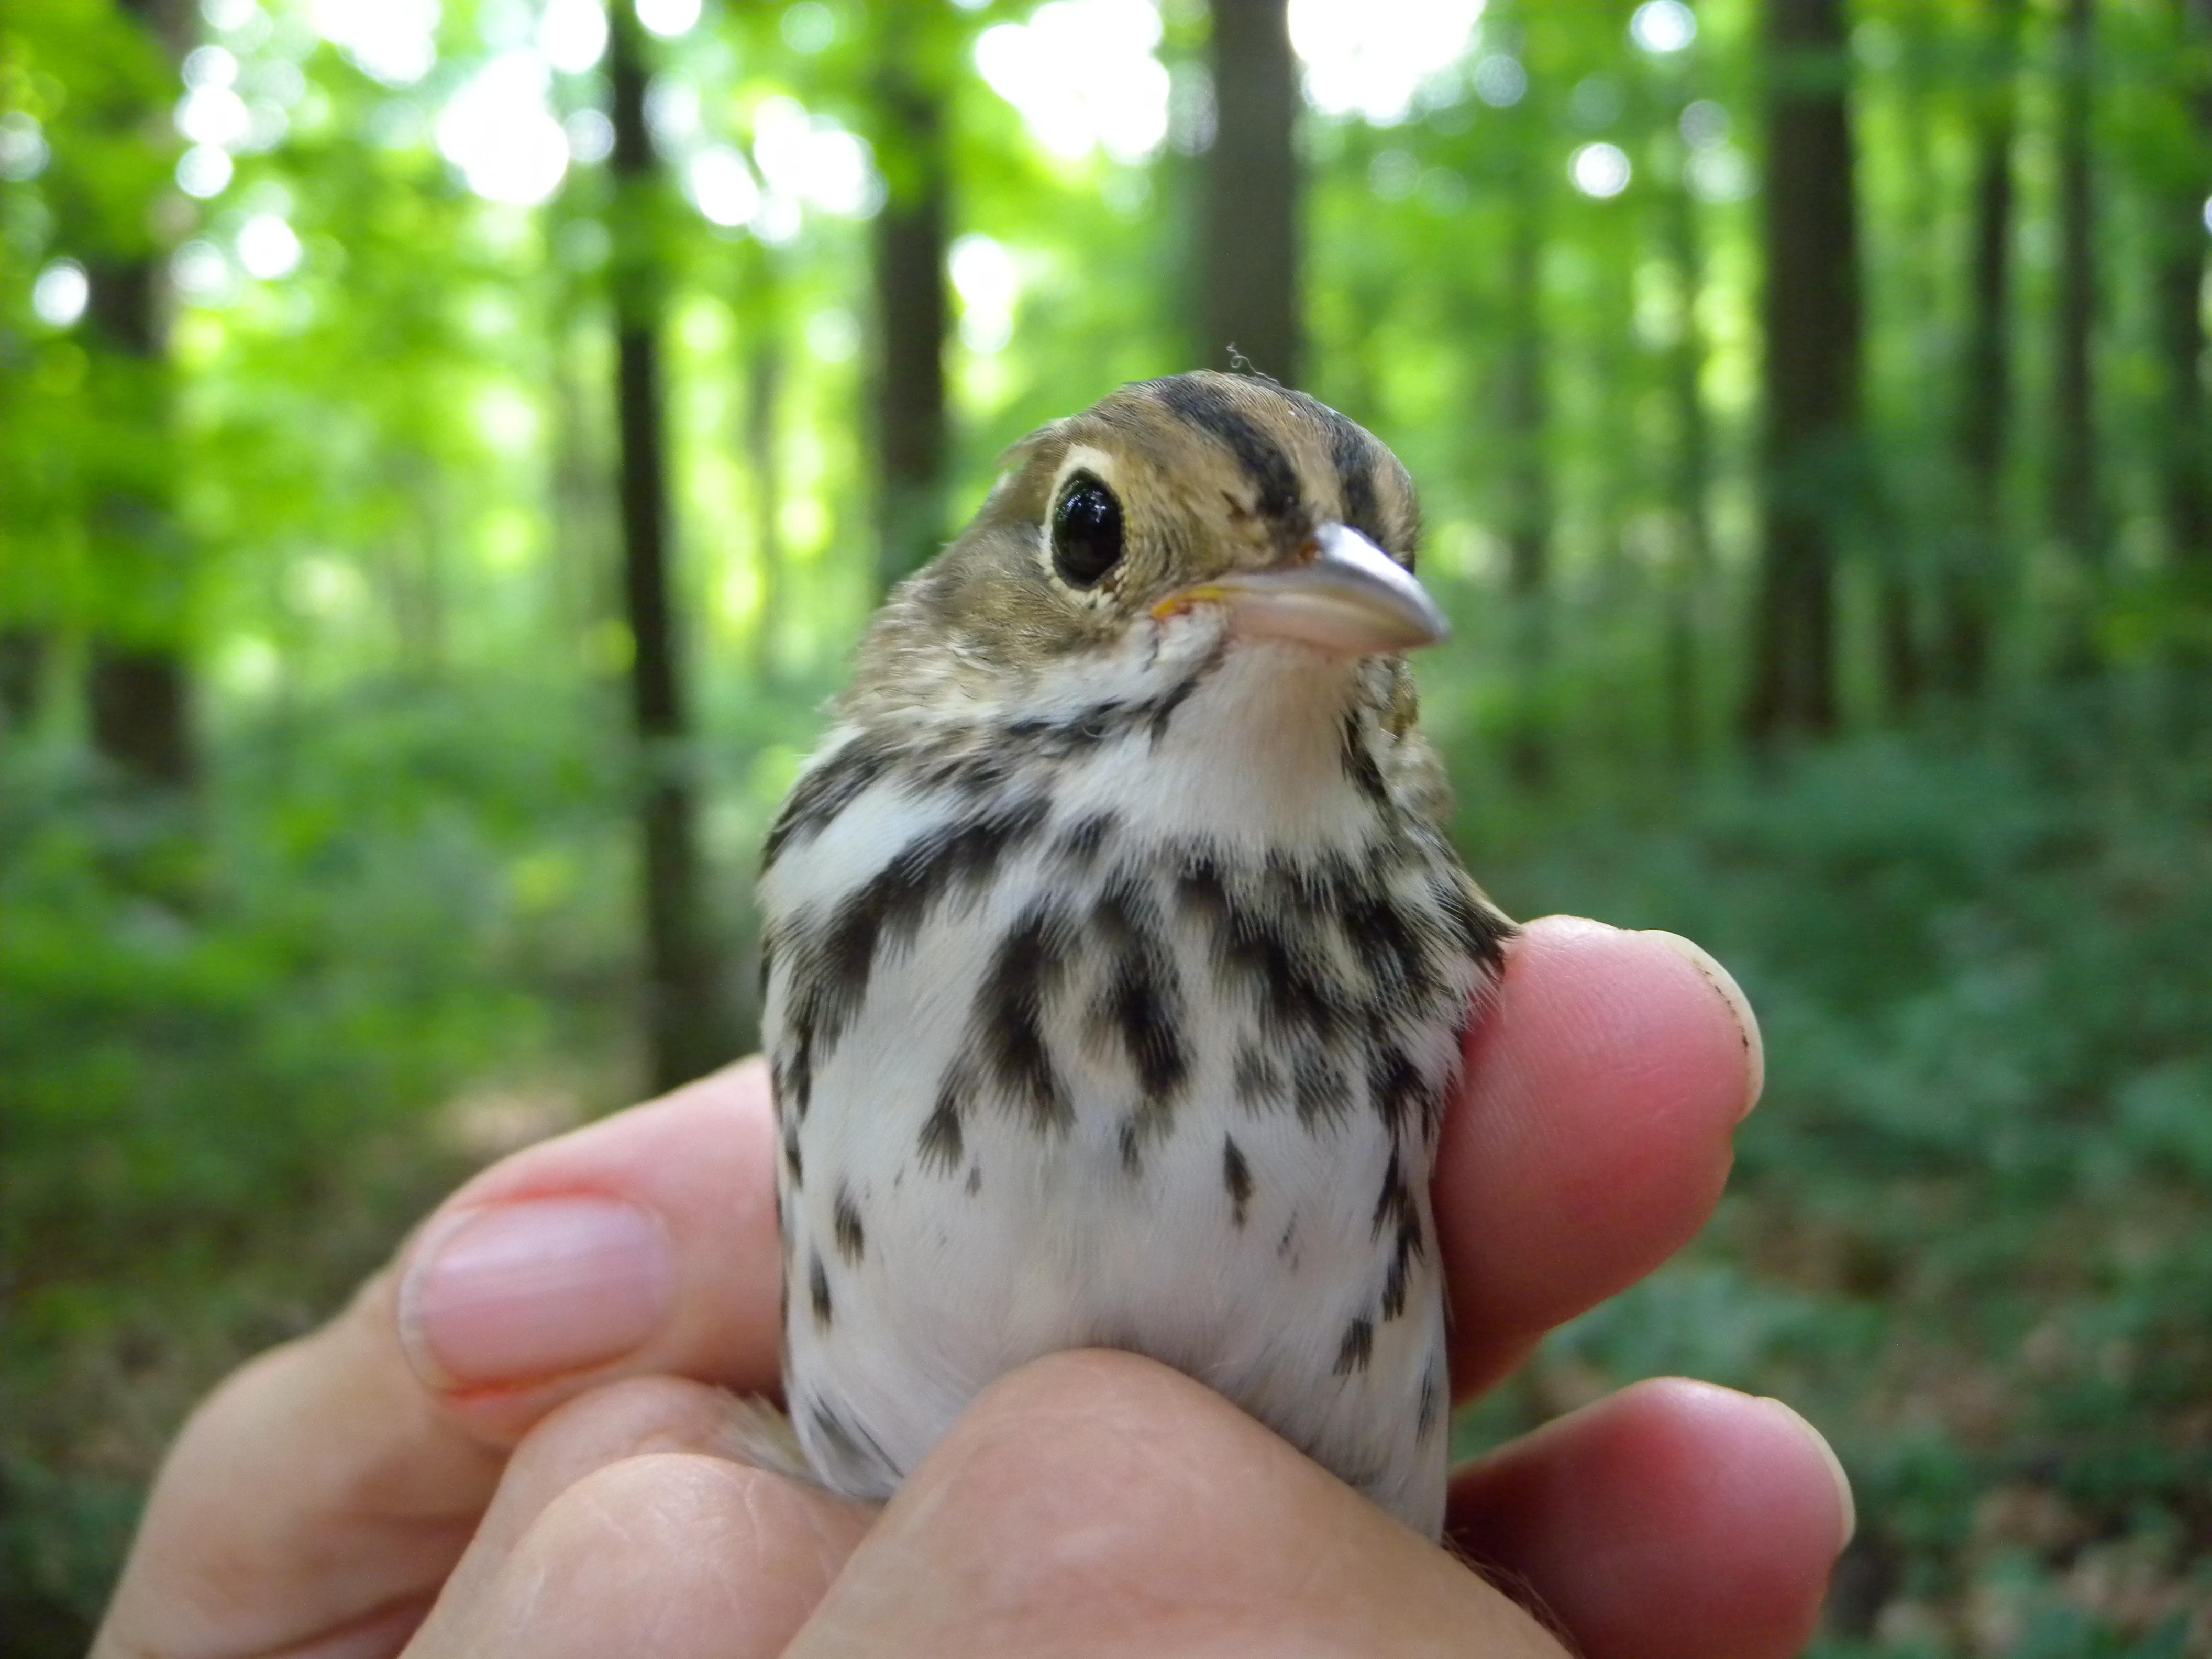 Juvenile Ovenbird in Rushton Woods. Photo by Blake Goll.